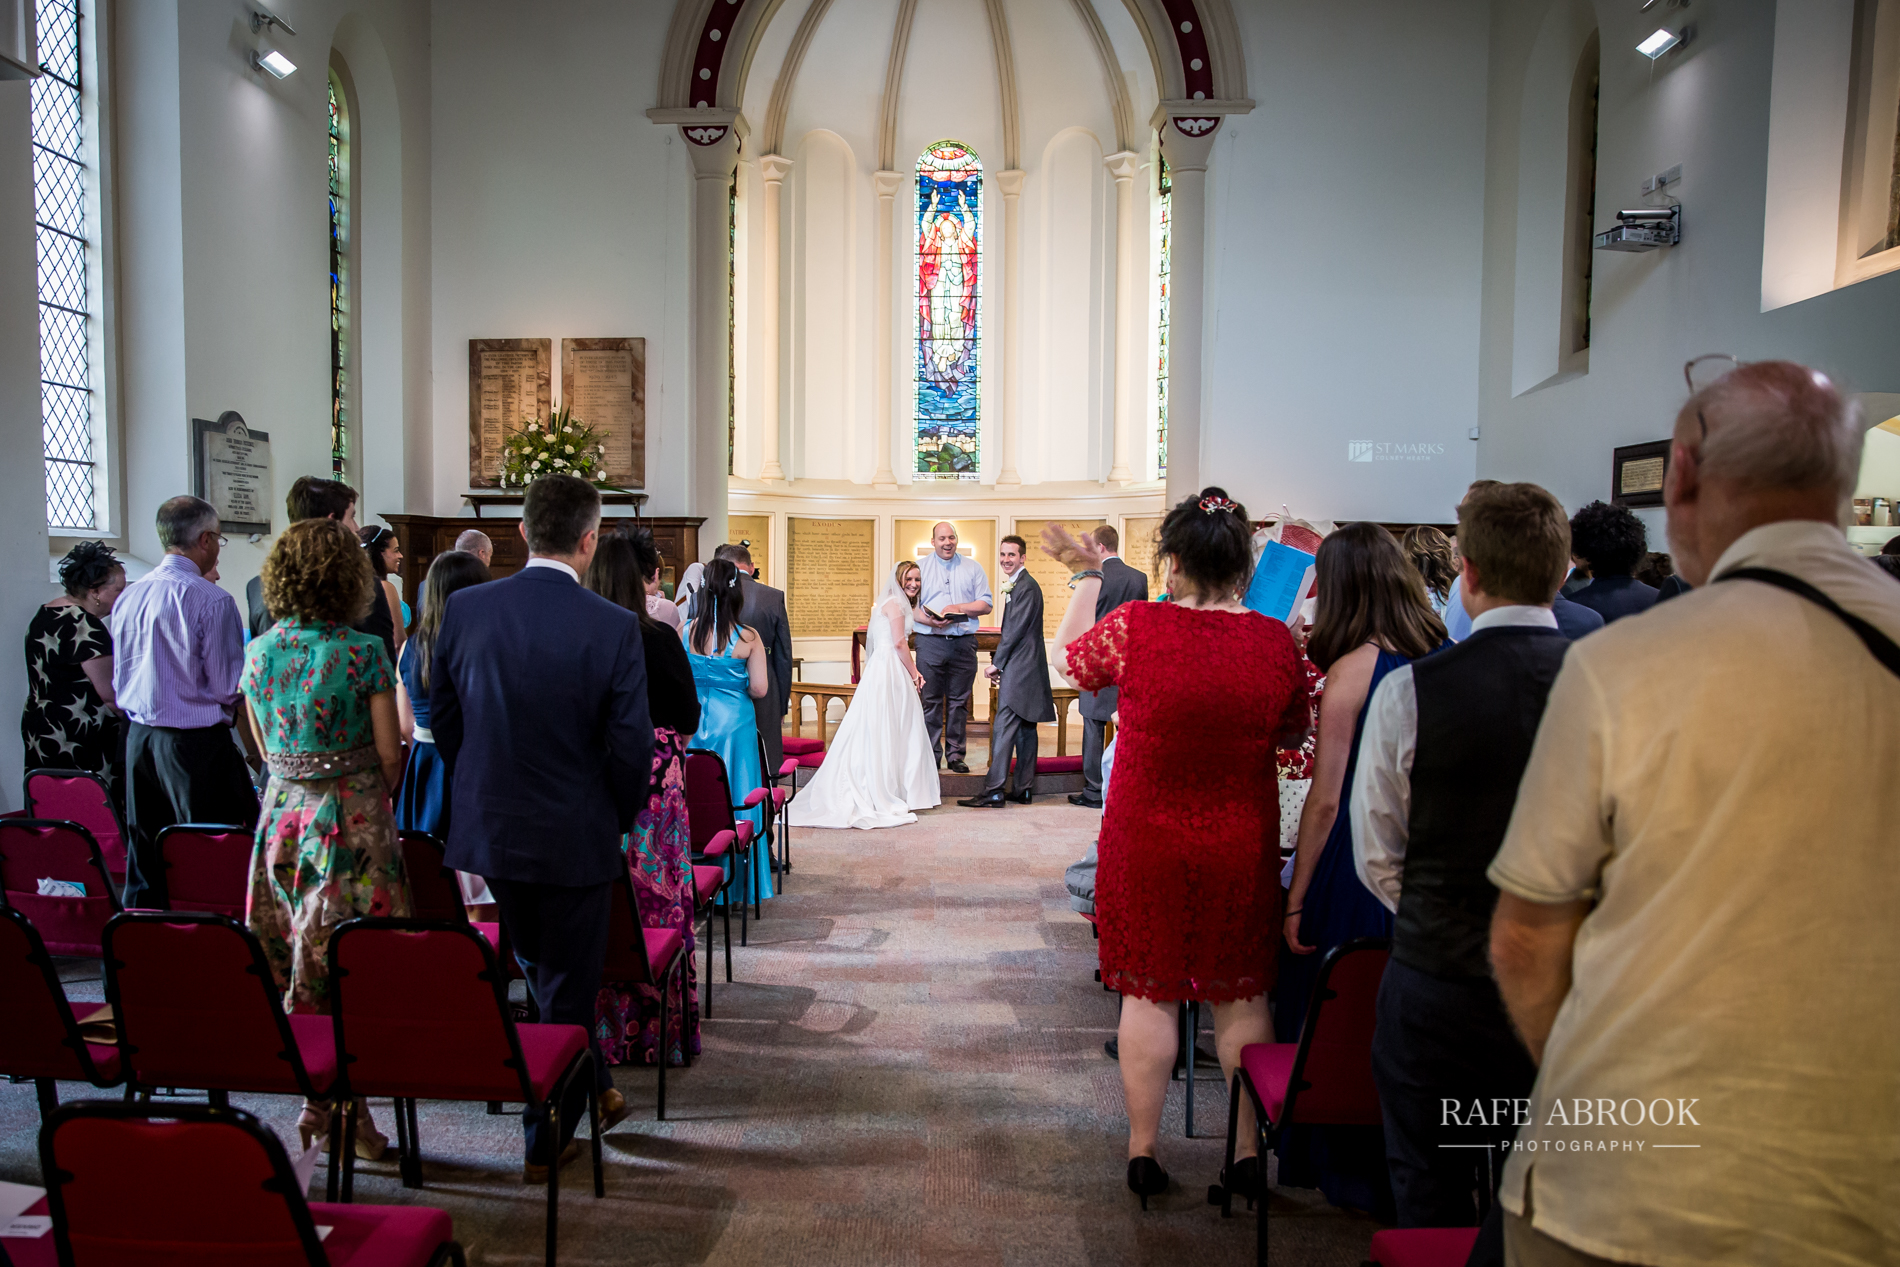 wedding photographer hertfordshire noke thistle hotel st albans -1113.jpg